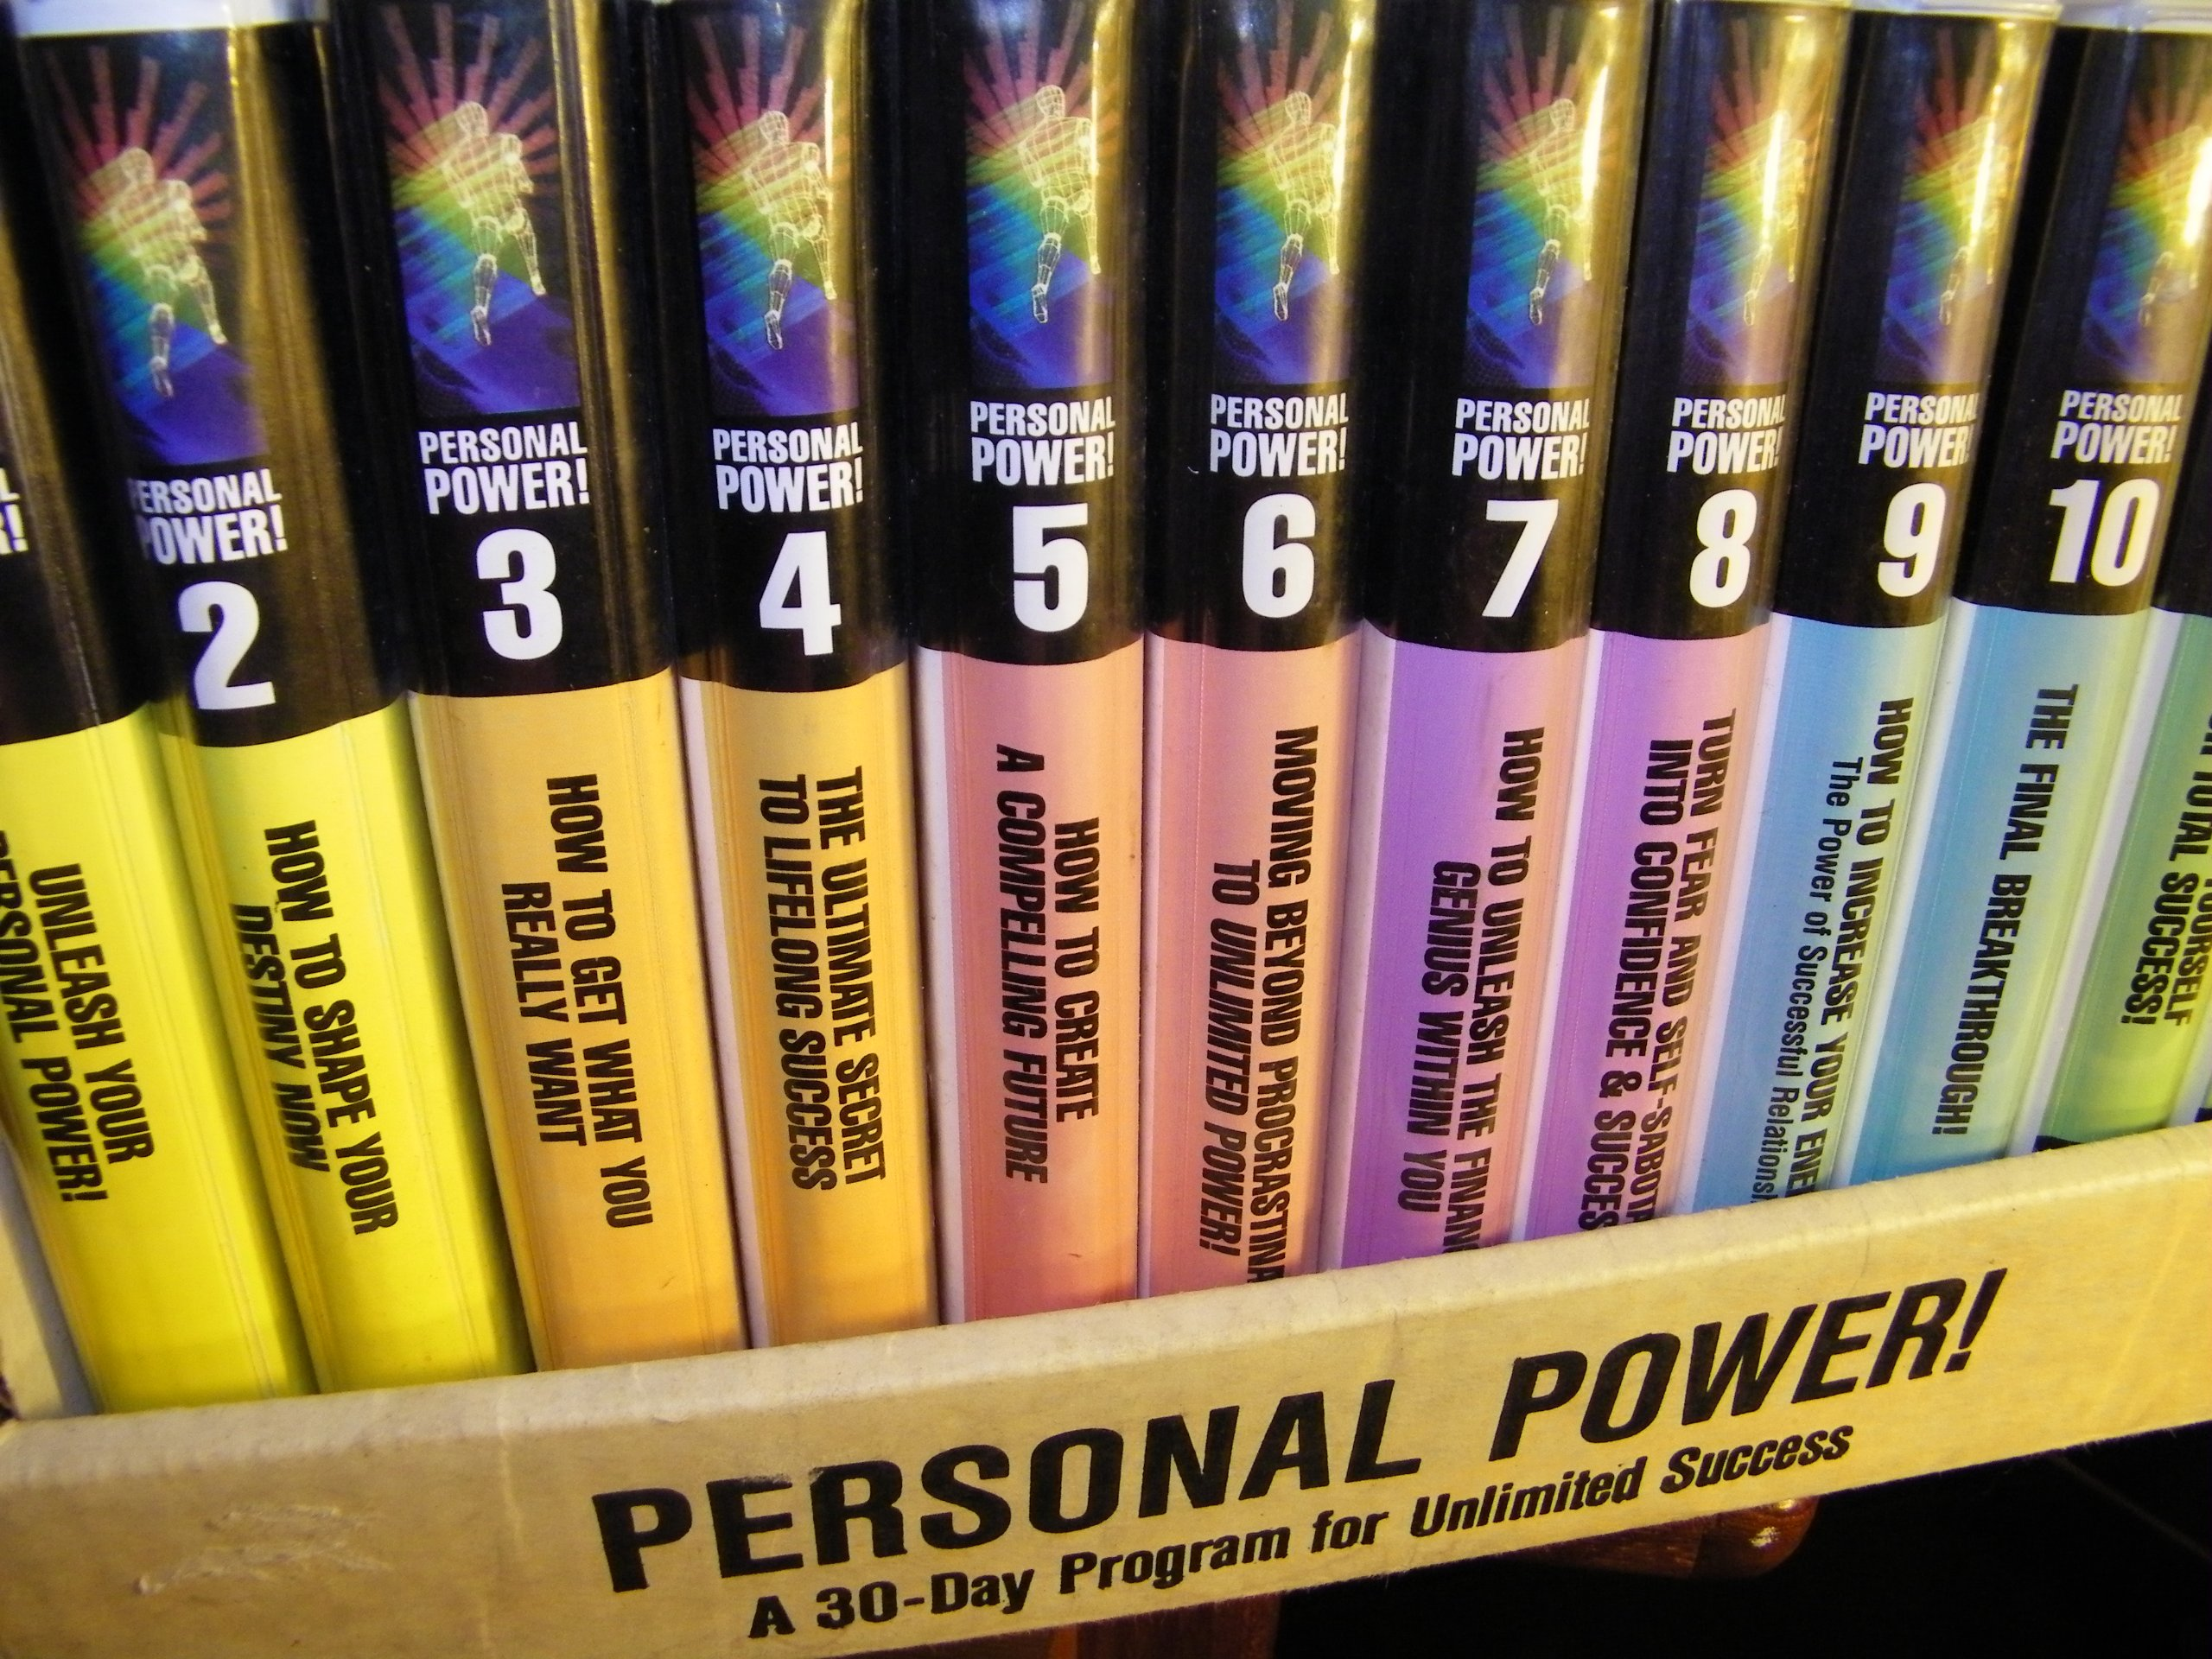 Anthony Robbins Personal Power: A 30 Day Program (24 Audio